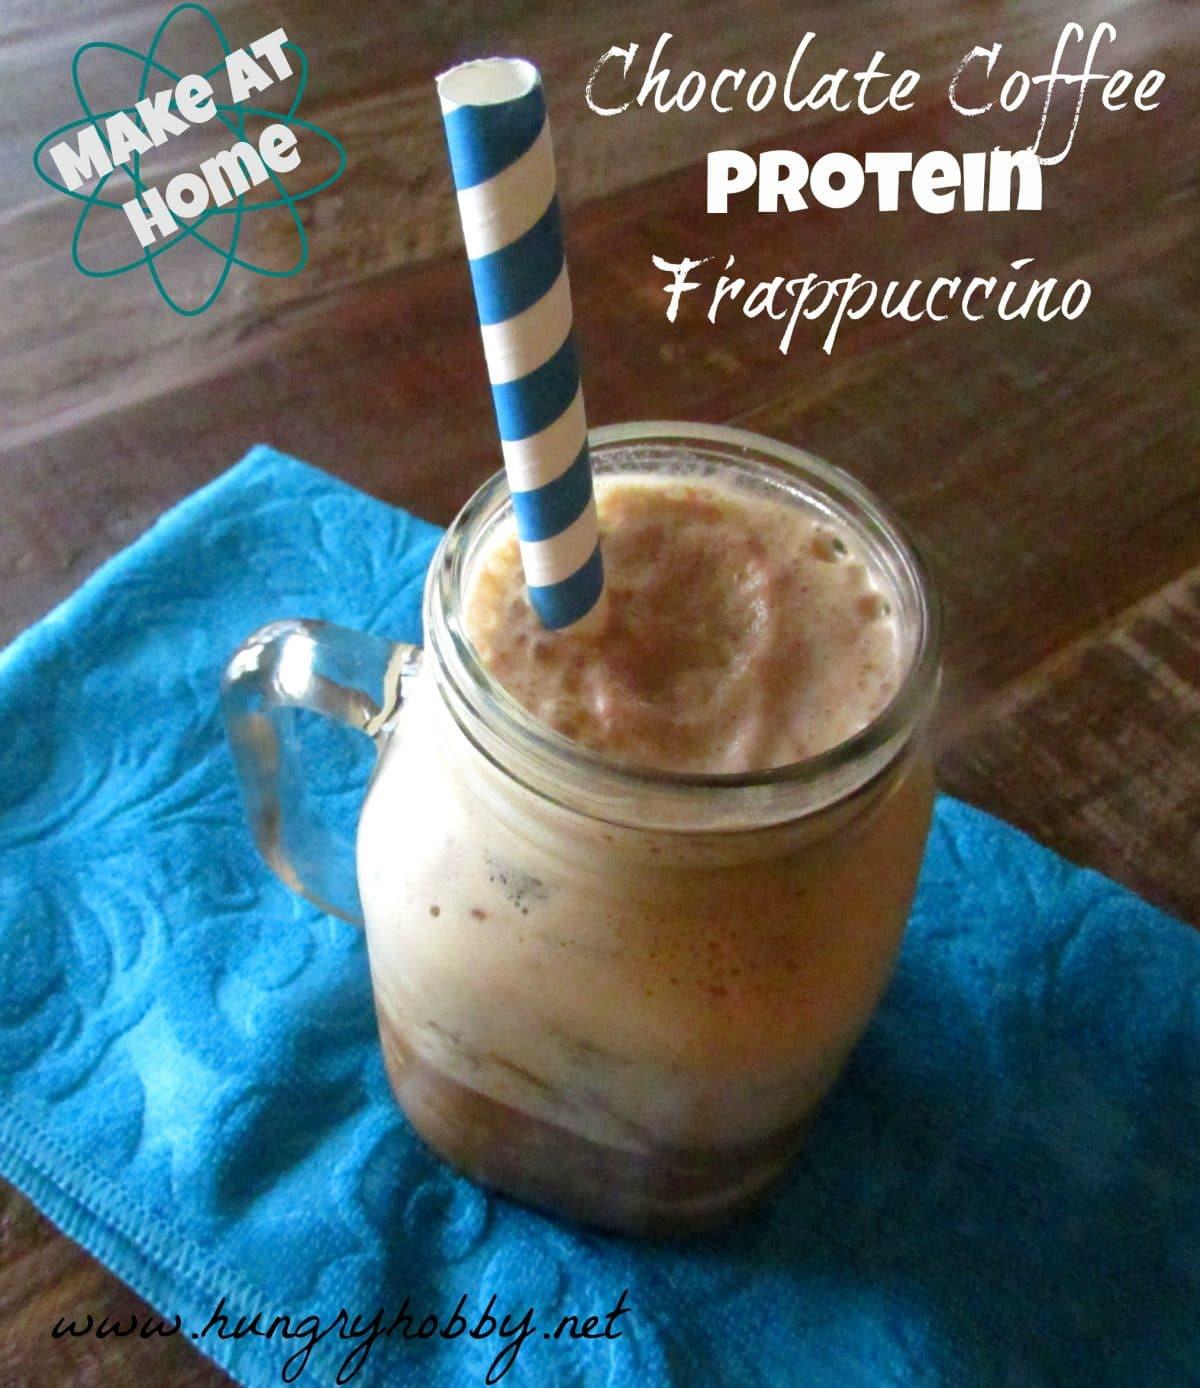 Chocolate Coffee Protein